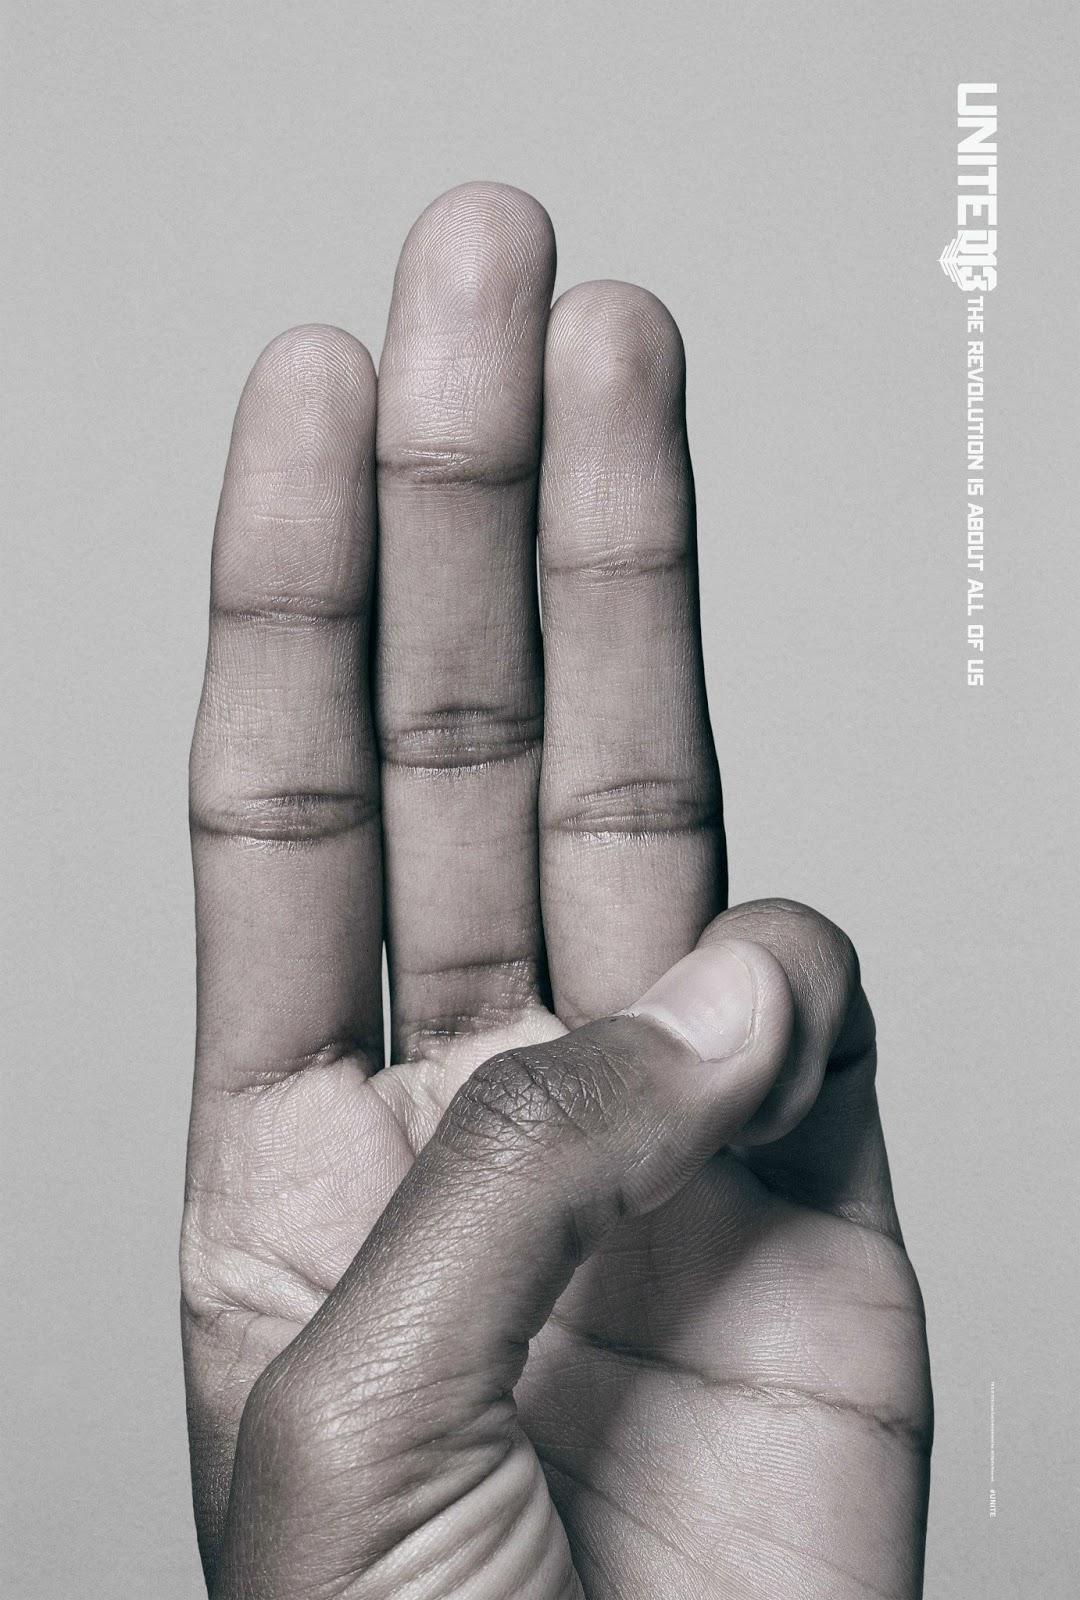 unite-poster-mockingjay (6)